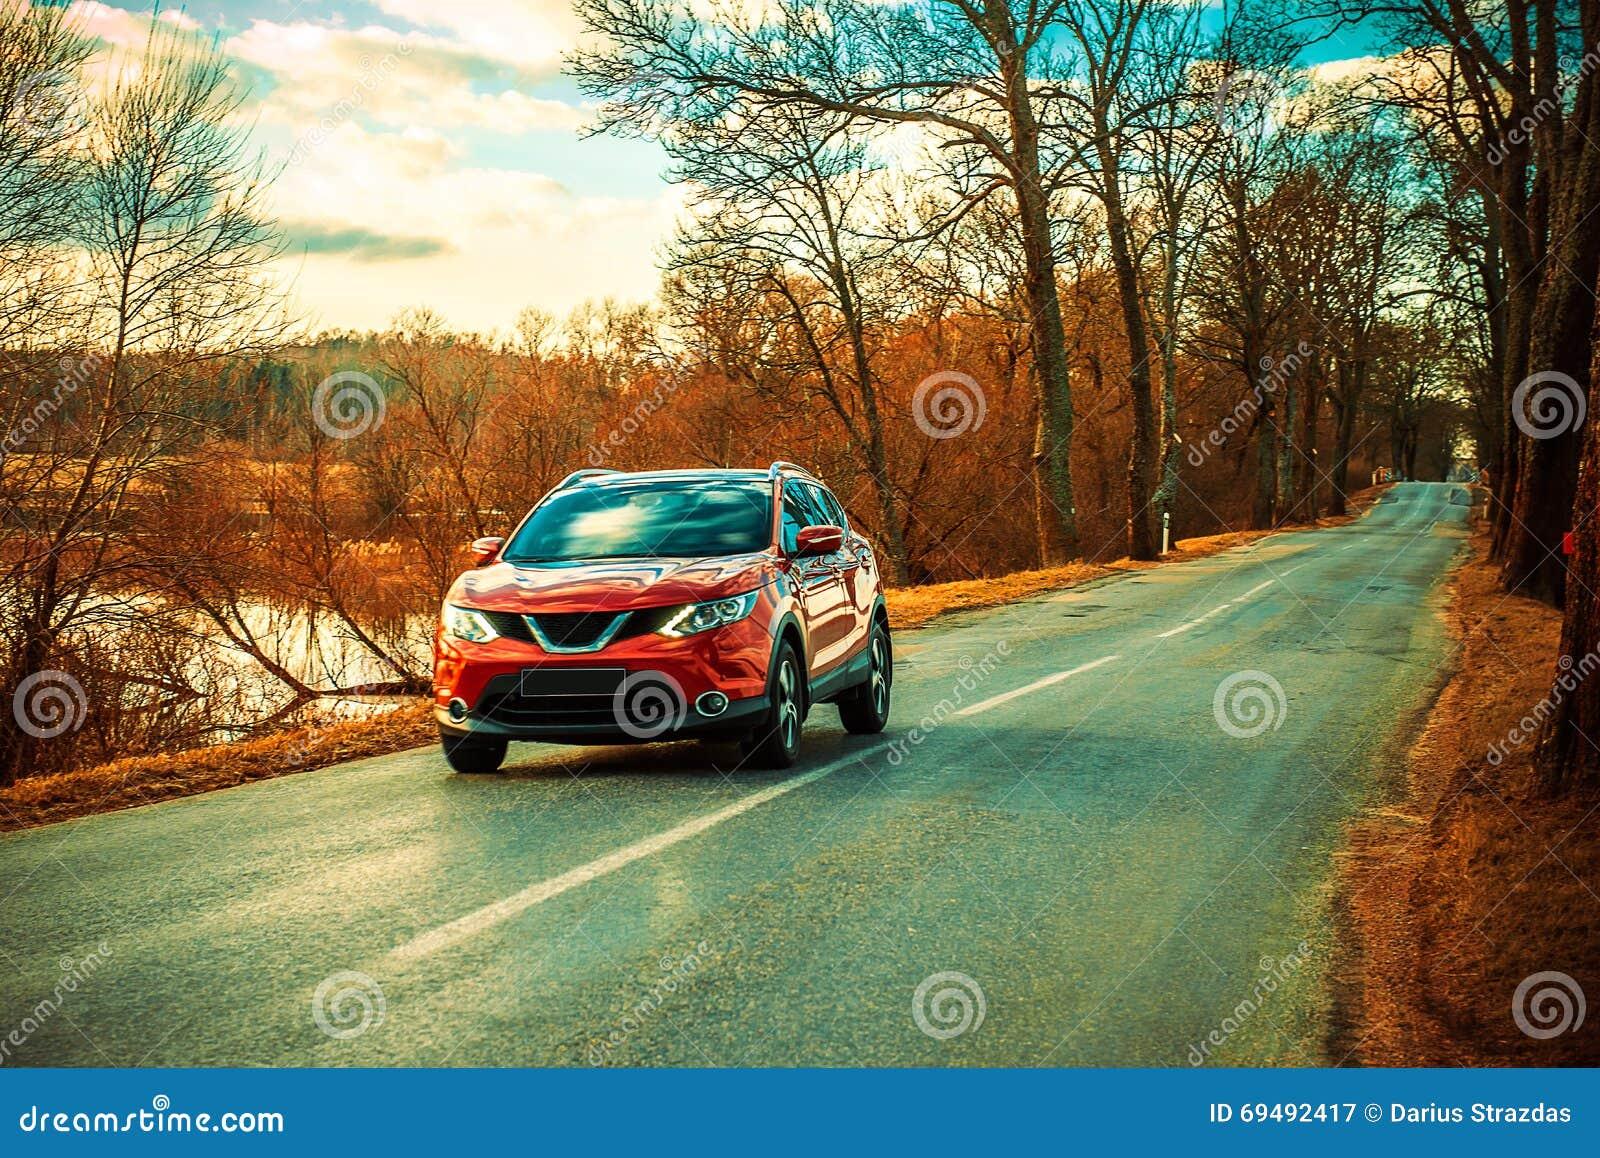 Red car and Asphalt road